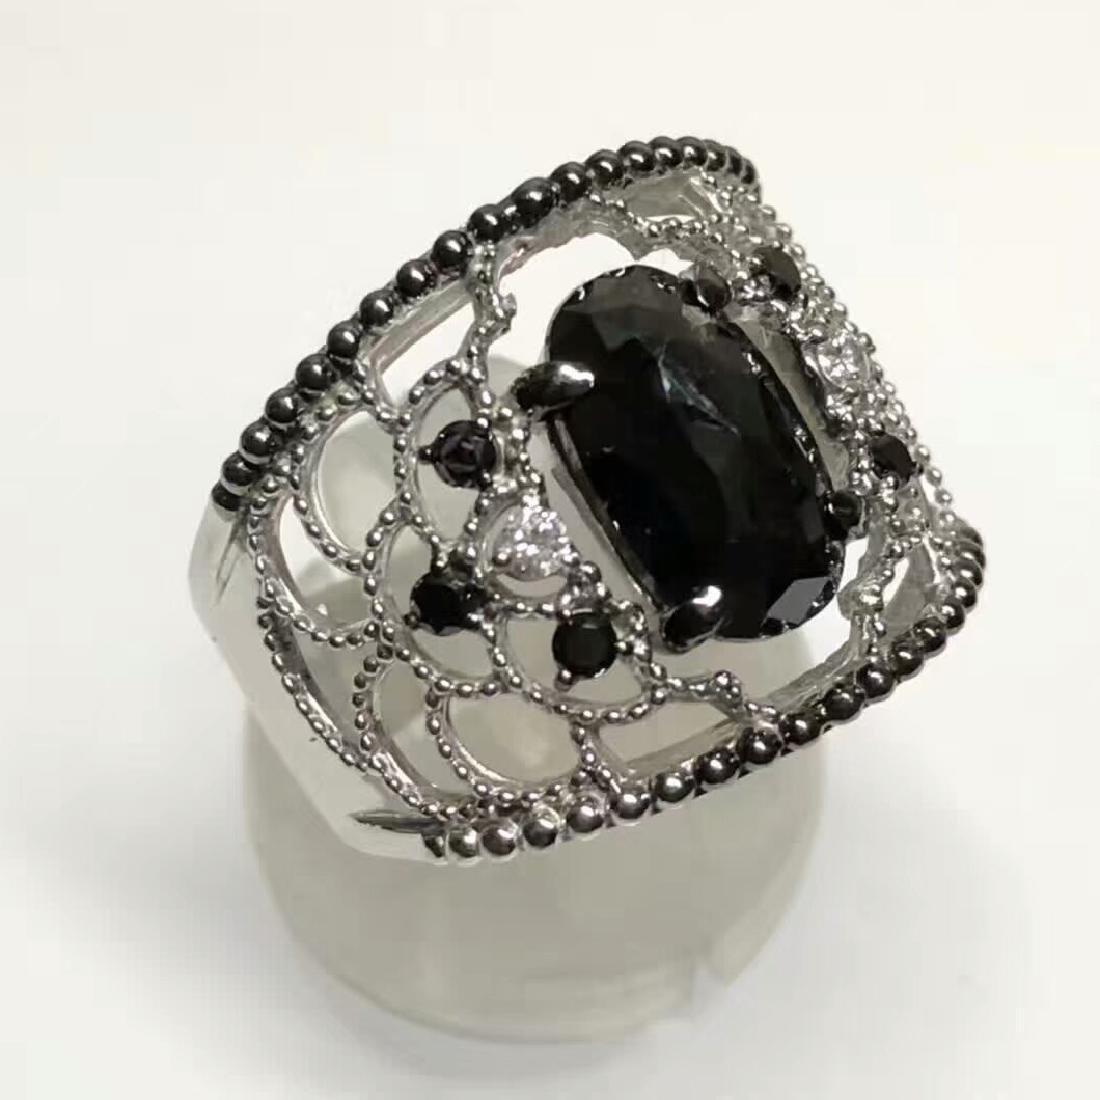 3.16ct Black Diamond Ring in 18kt White Gold - 4